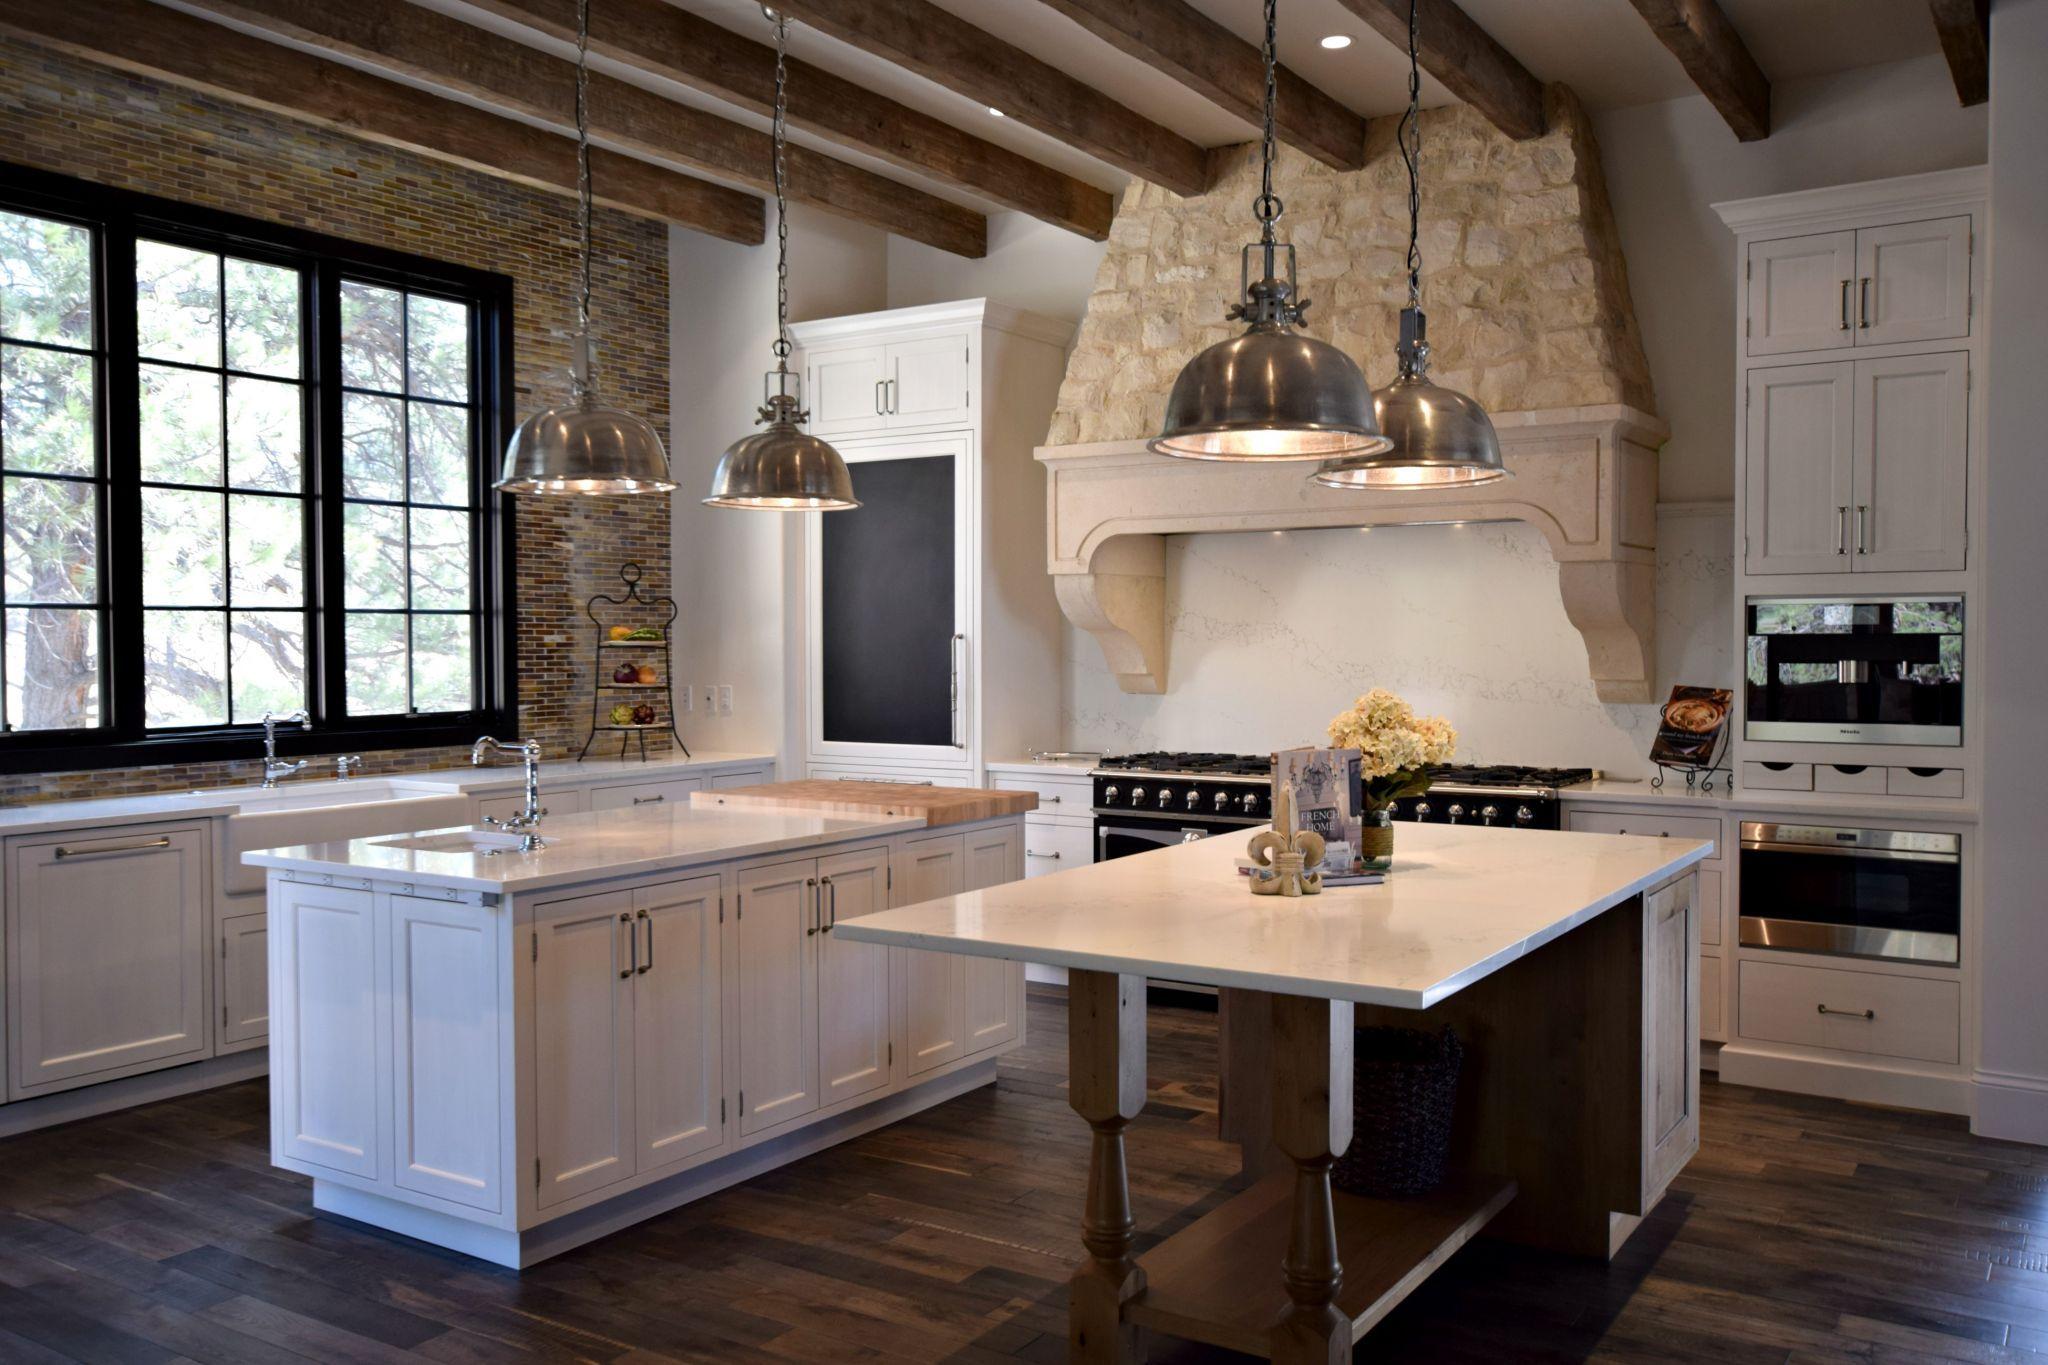 Bkc Kitchen And Bath Crystal Cabinets Denver Kitchen Kitchen